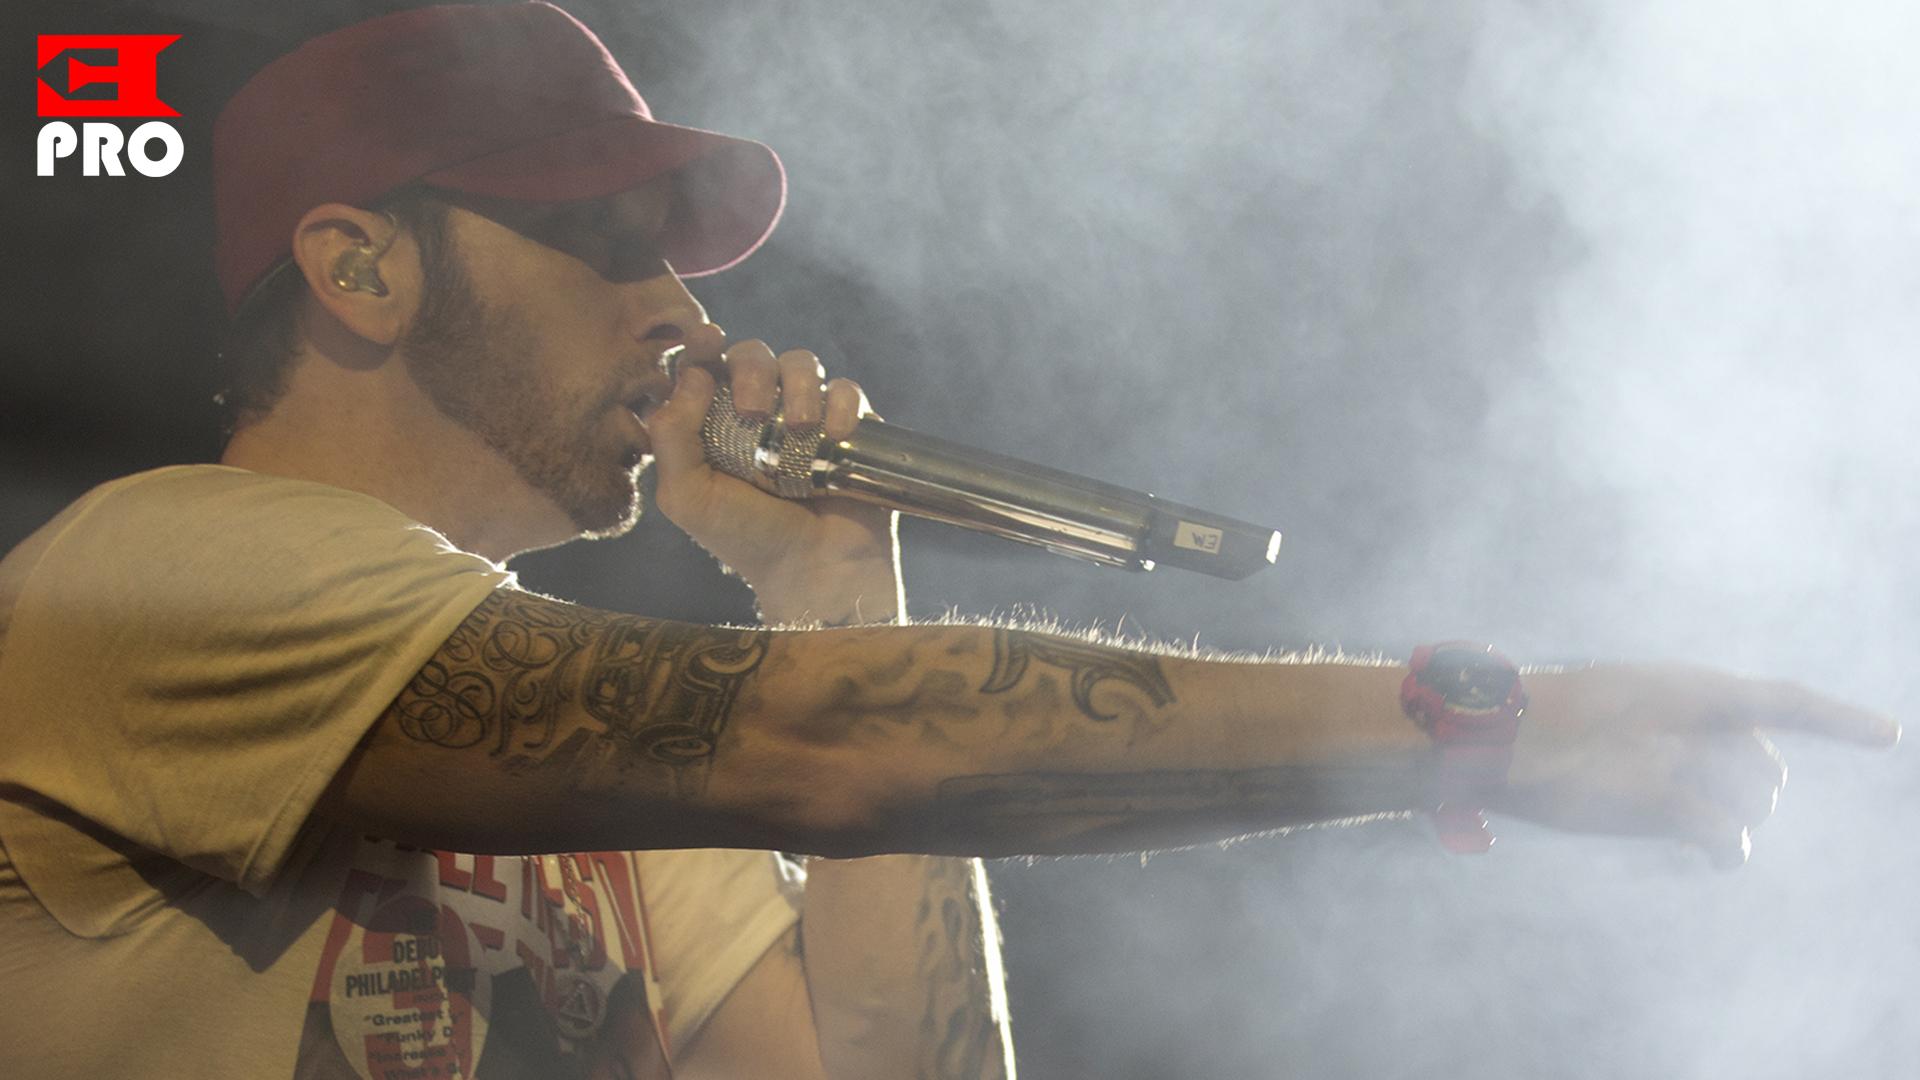 Eminem Live at Bramham Park, Leeds, England, 27.08.2017 (Leeds Festival 2017, Full Concert, 1080p)